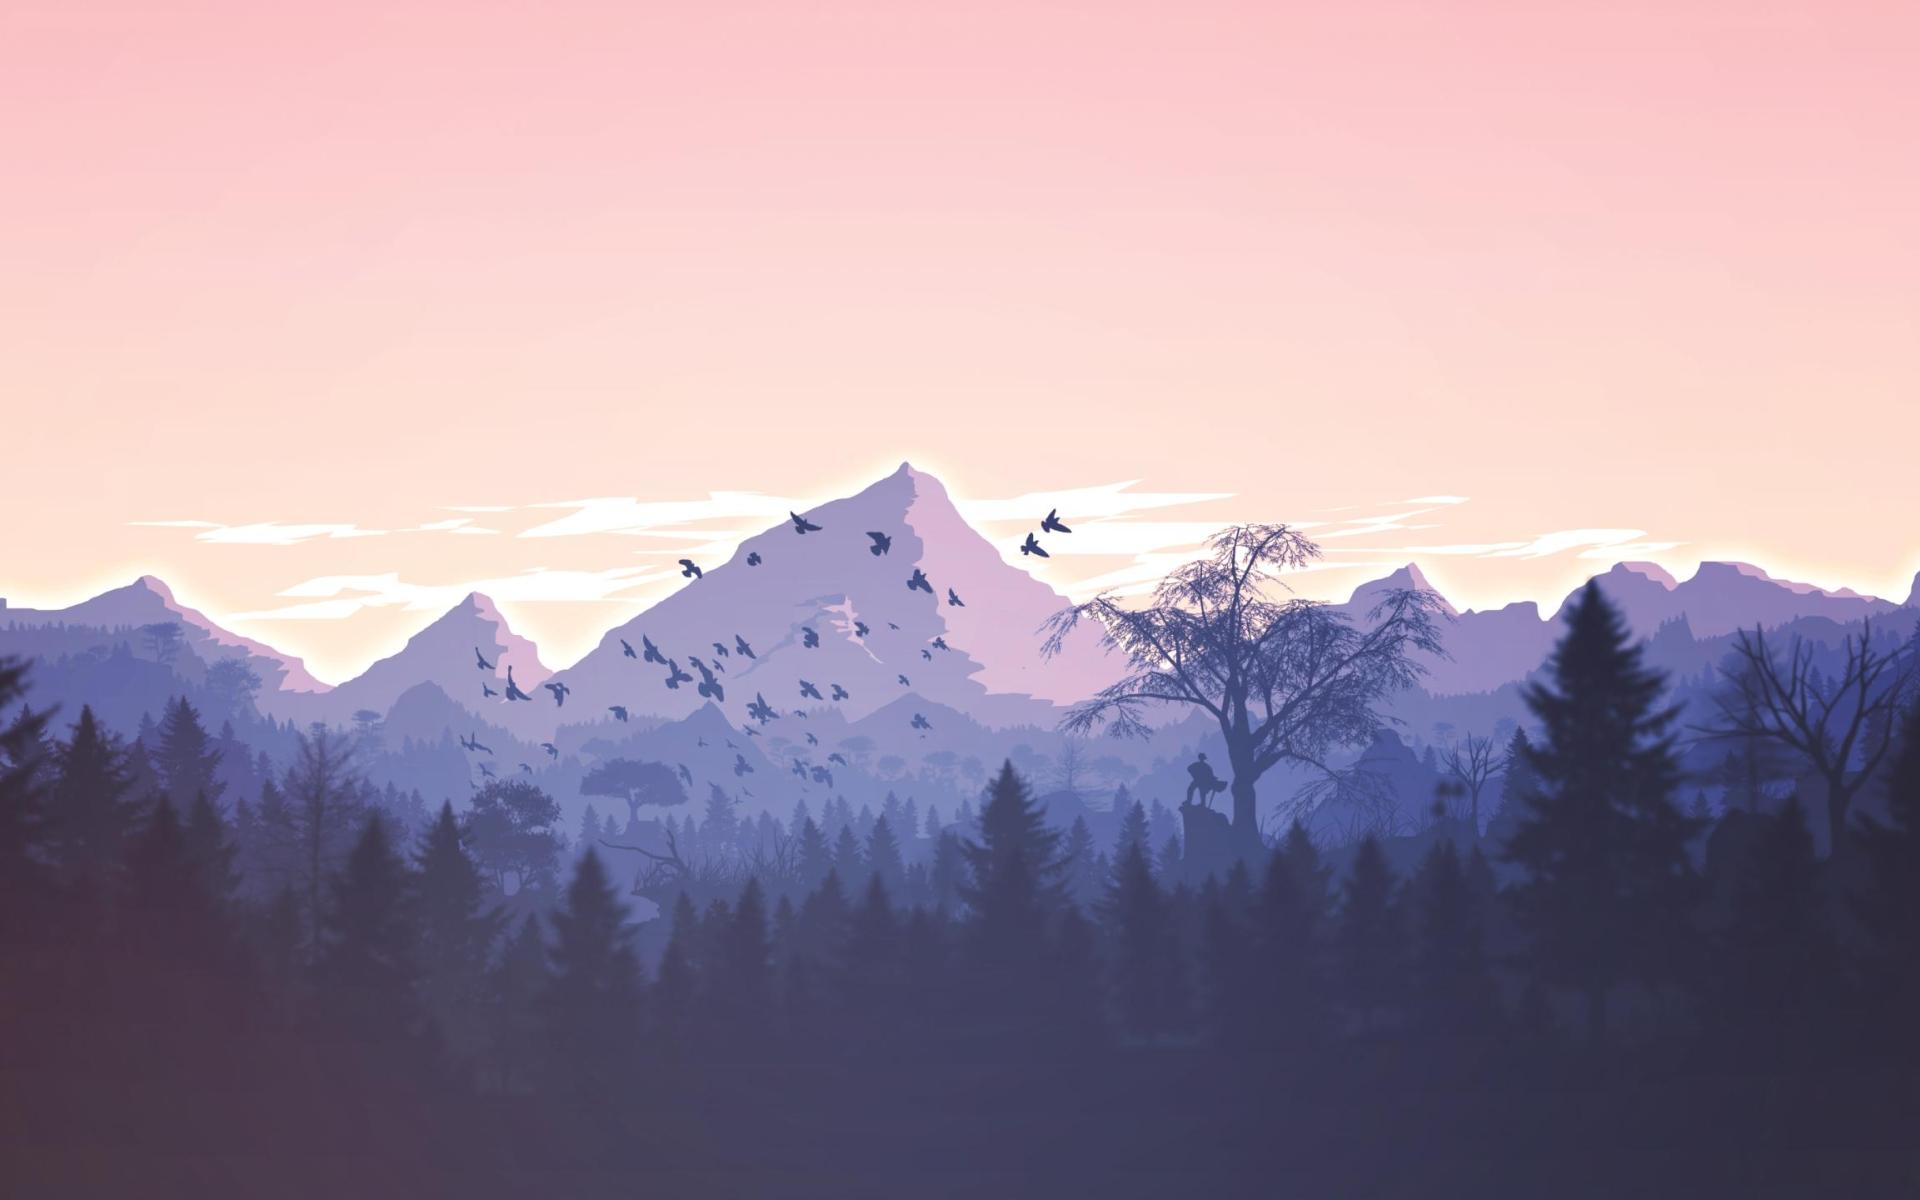 Minimalism Mountain Peak Full Hd Wallpaper: Download Minimalism Birds Mountains Trees Forest 840x1160